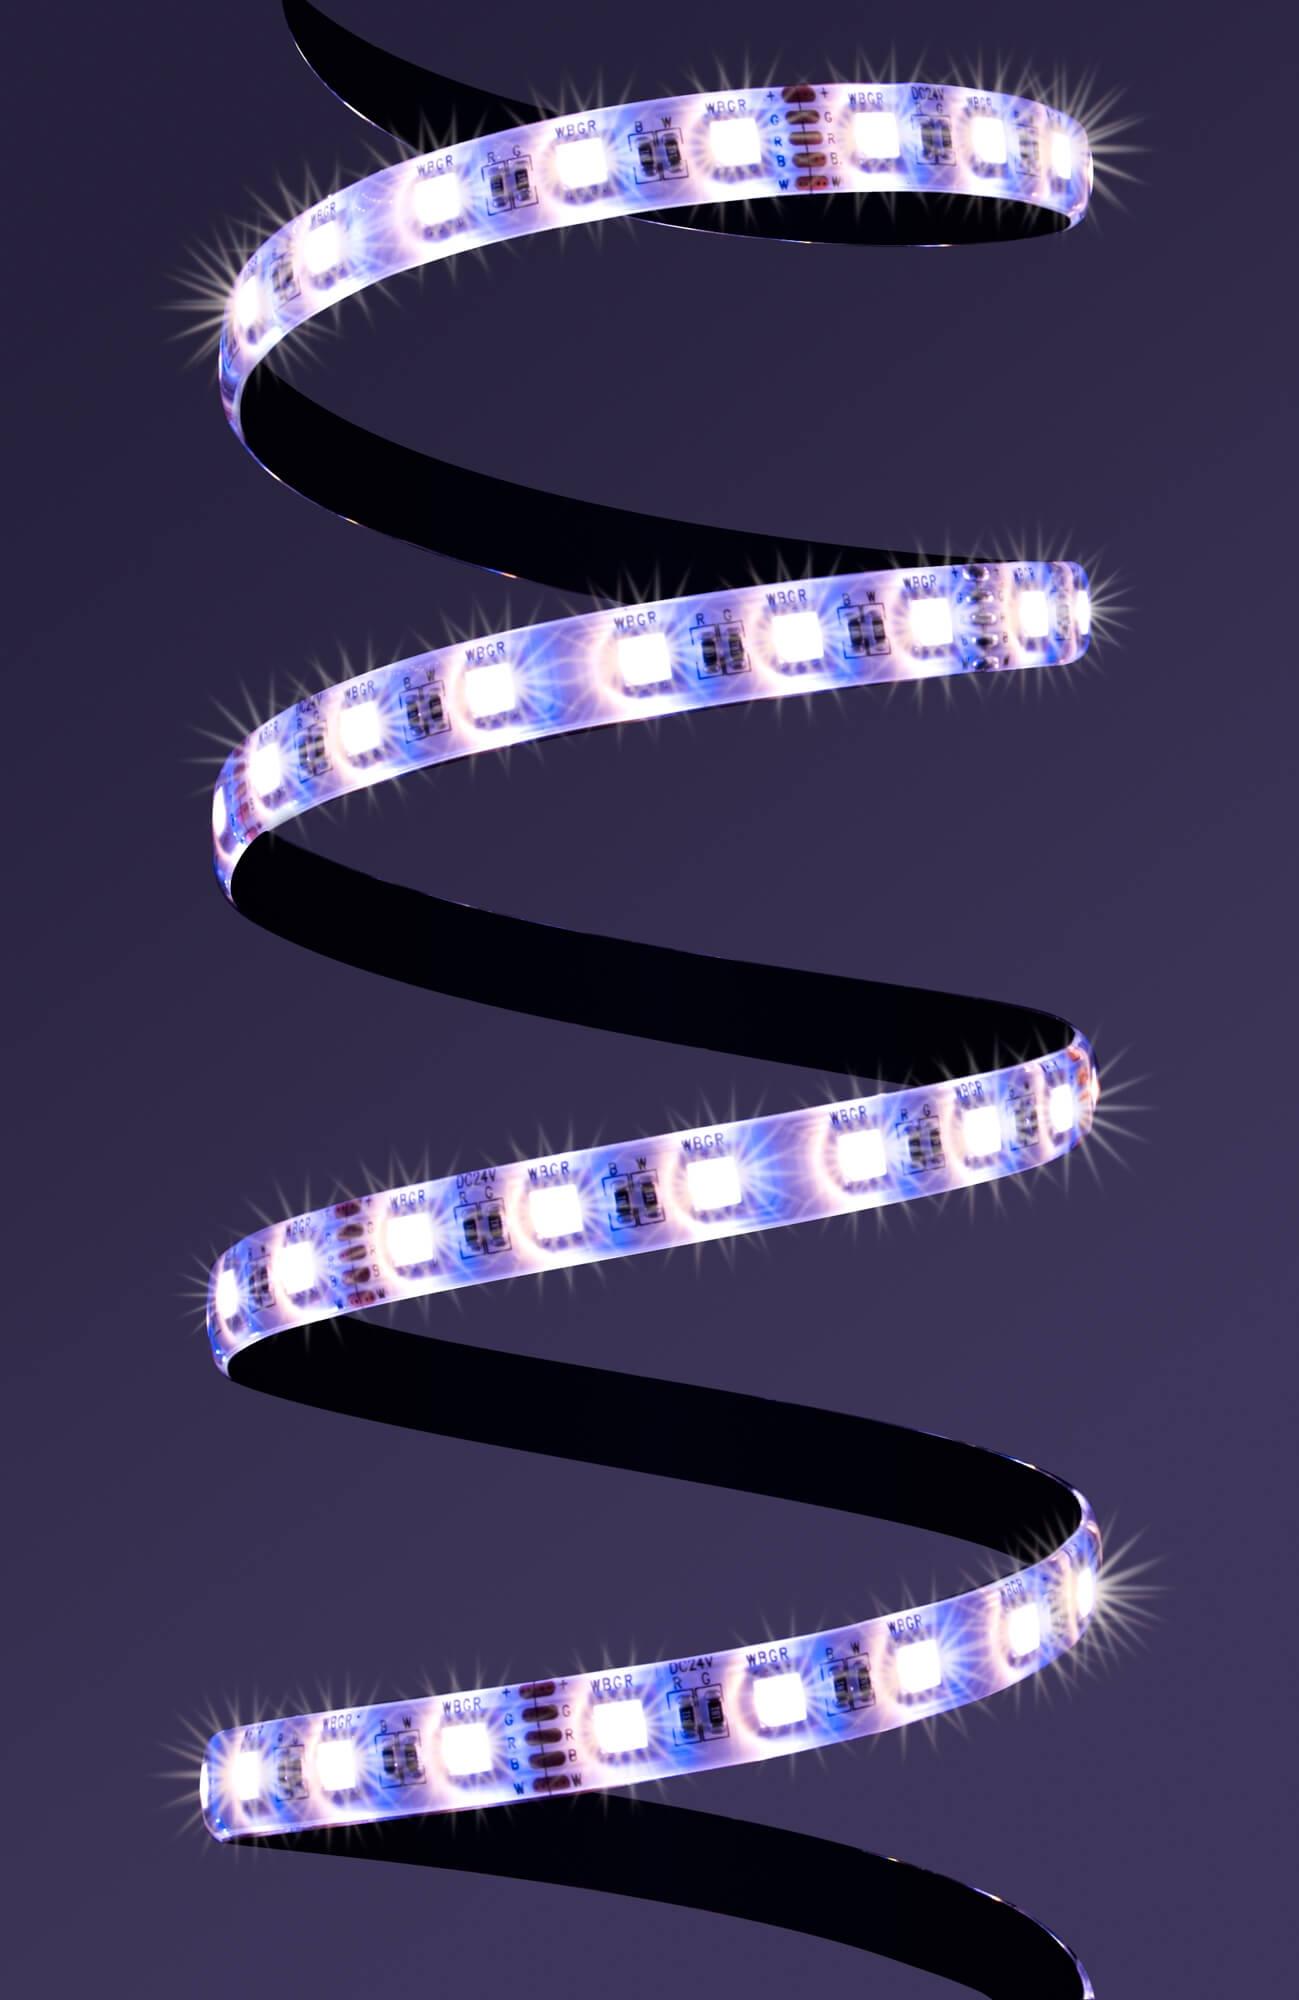 /4/i/4in1-violett-ww.jpg